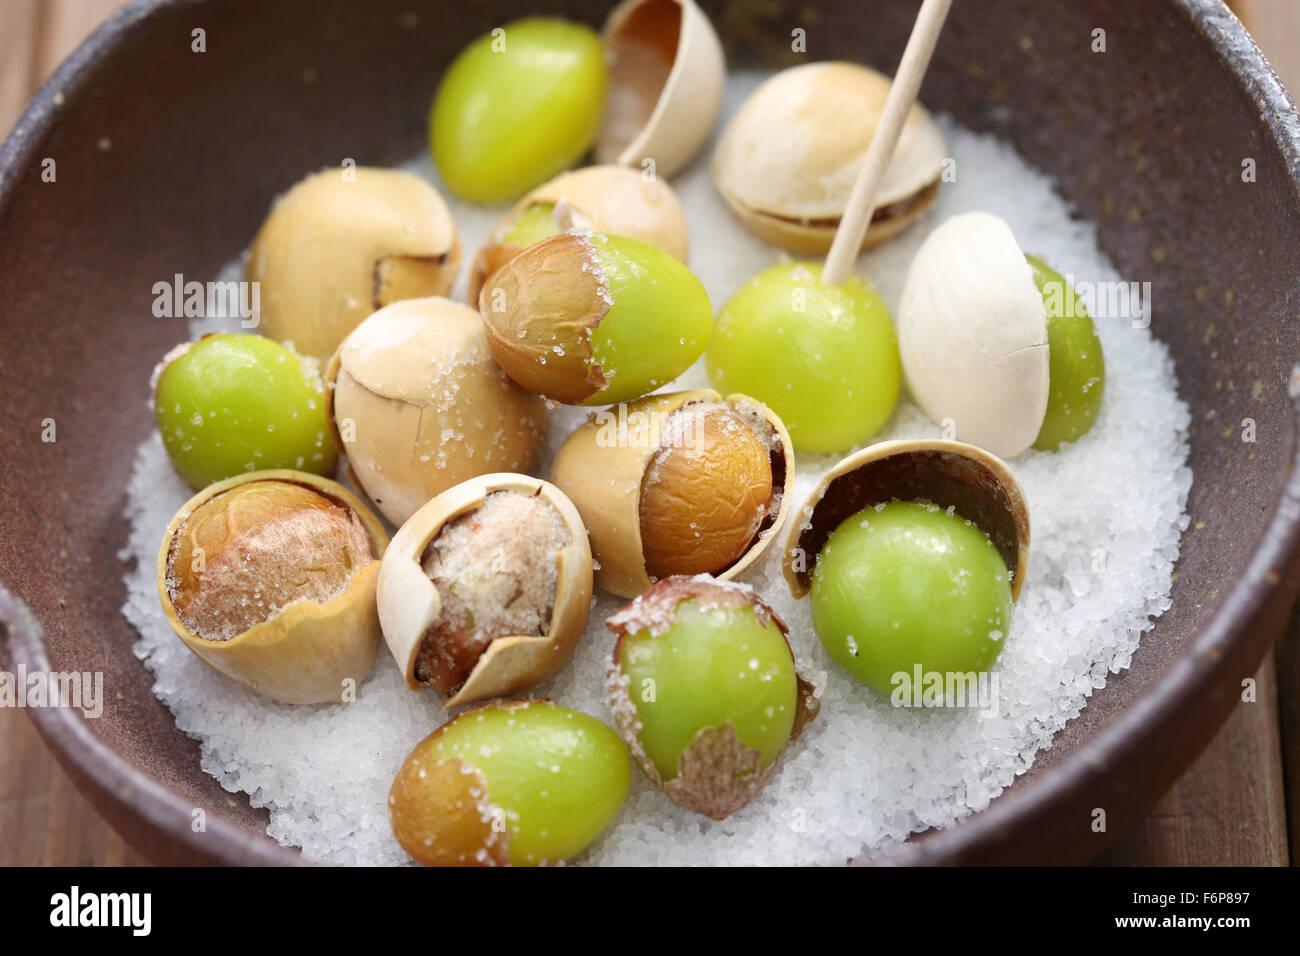 Rôti de sel, noix de ginkgo Japanese food, Close up Photo Stock